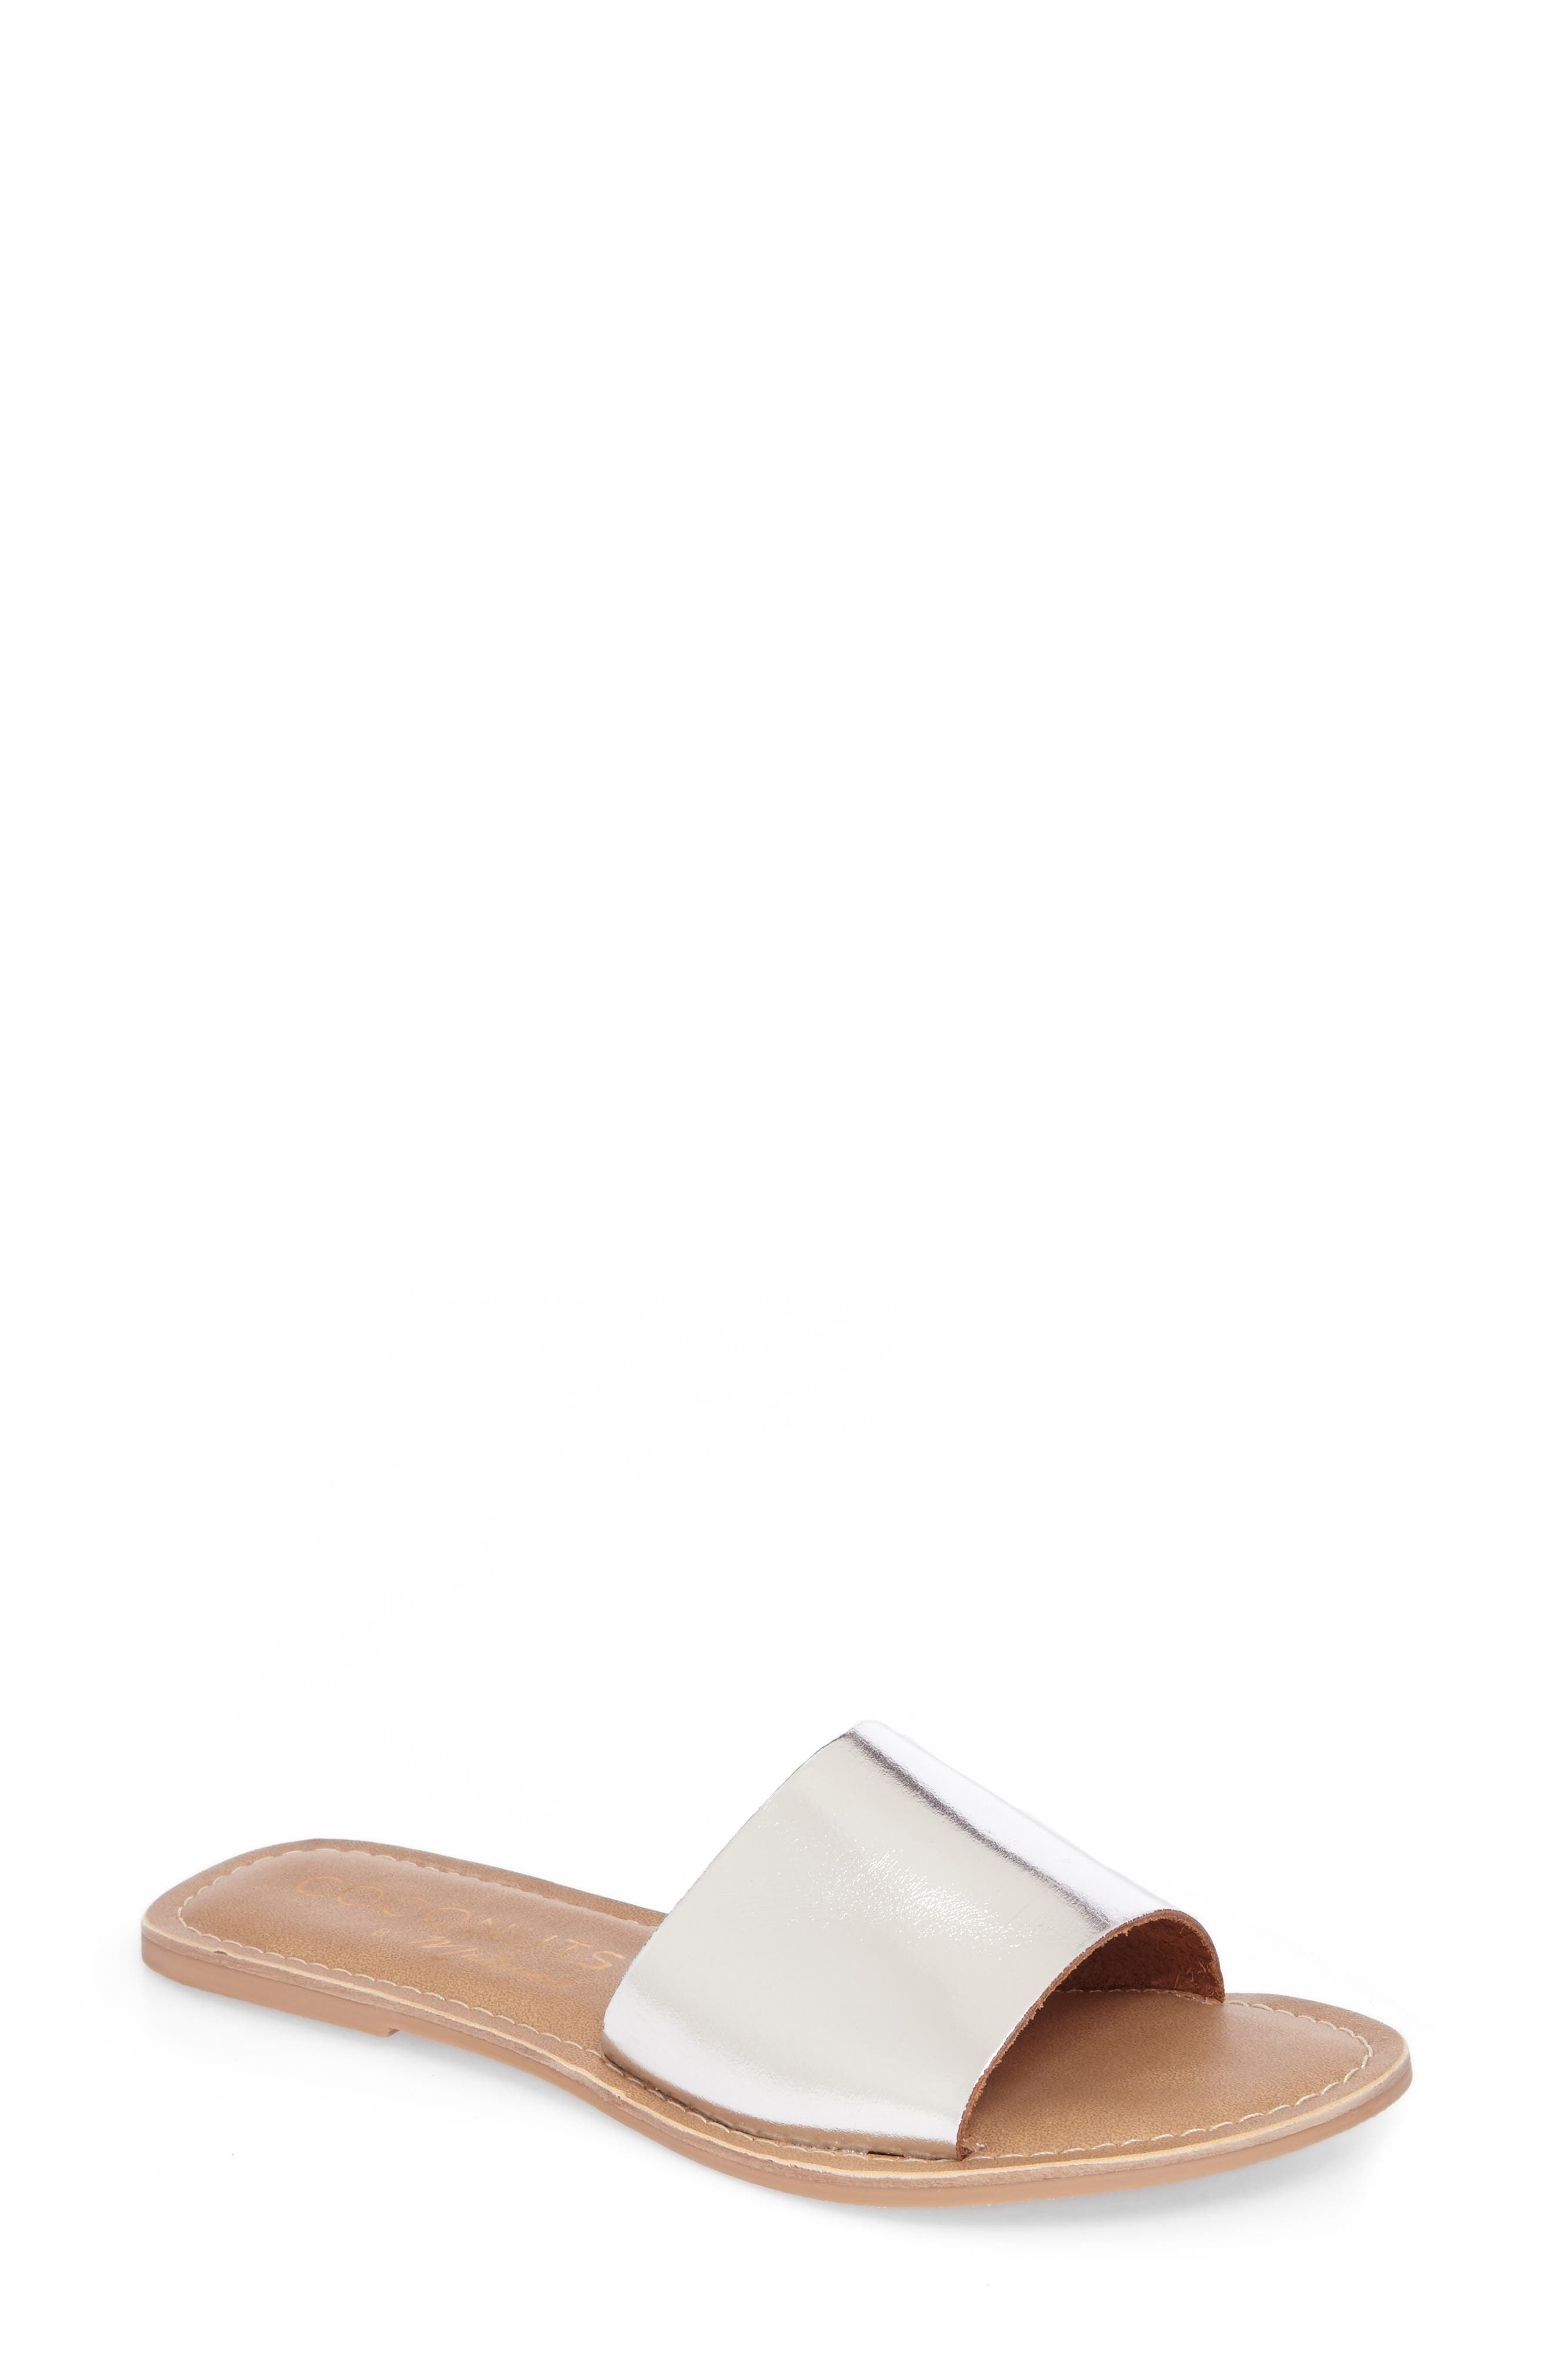 Main Image - Coconuts by Matisse Cabana Slide Sandal (Women)